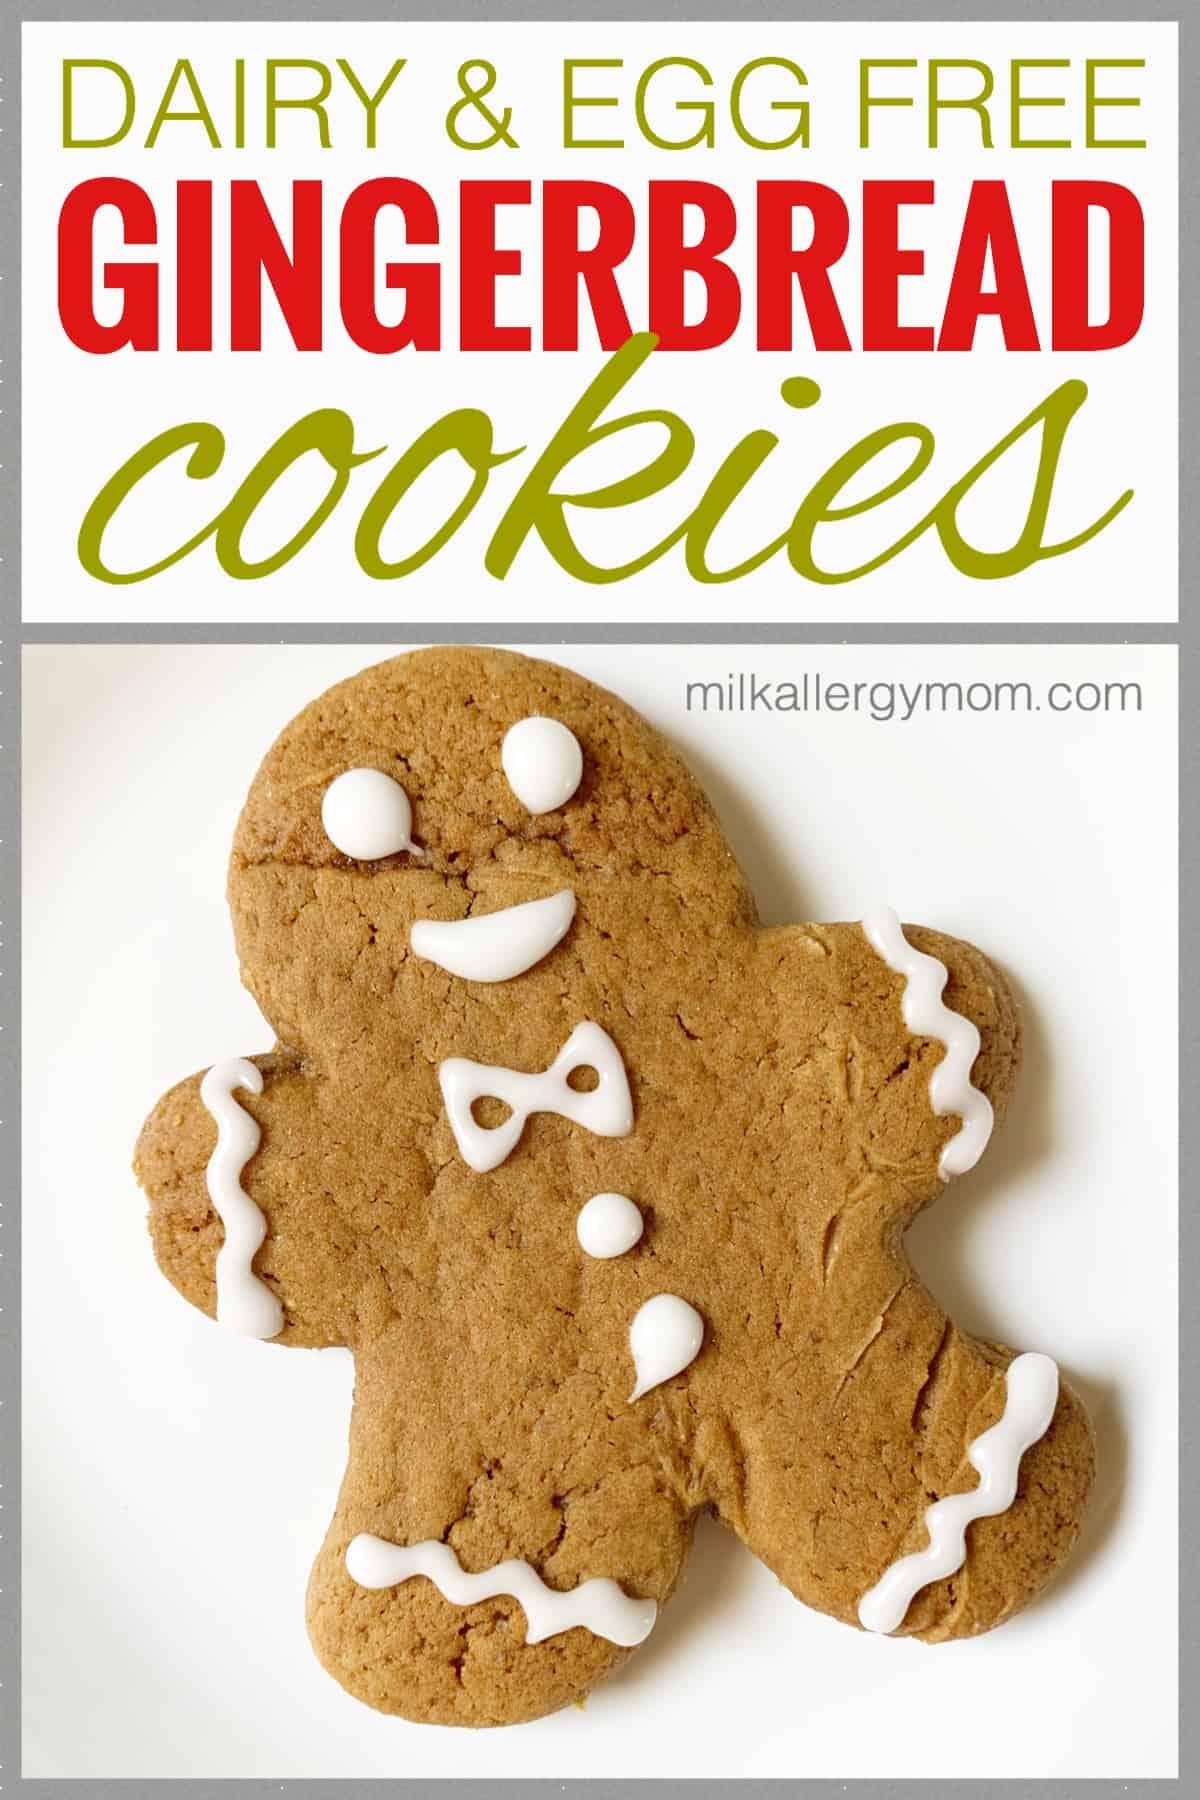 Gingerbread Cookies Dairy Egg Free